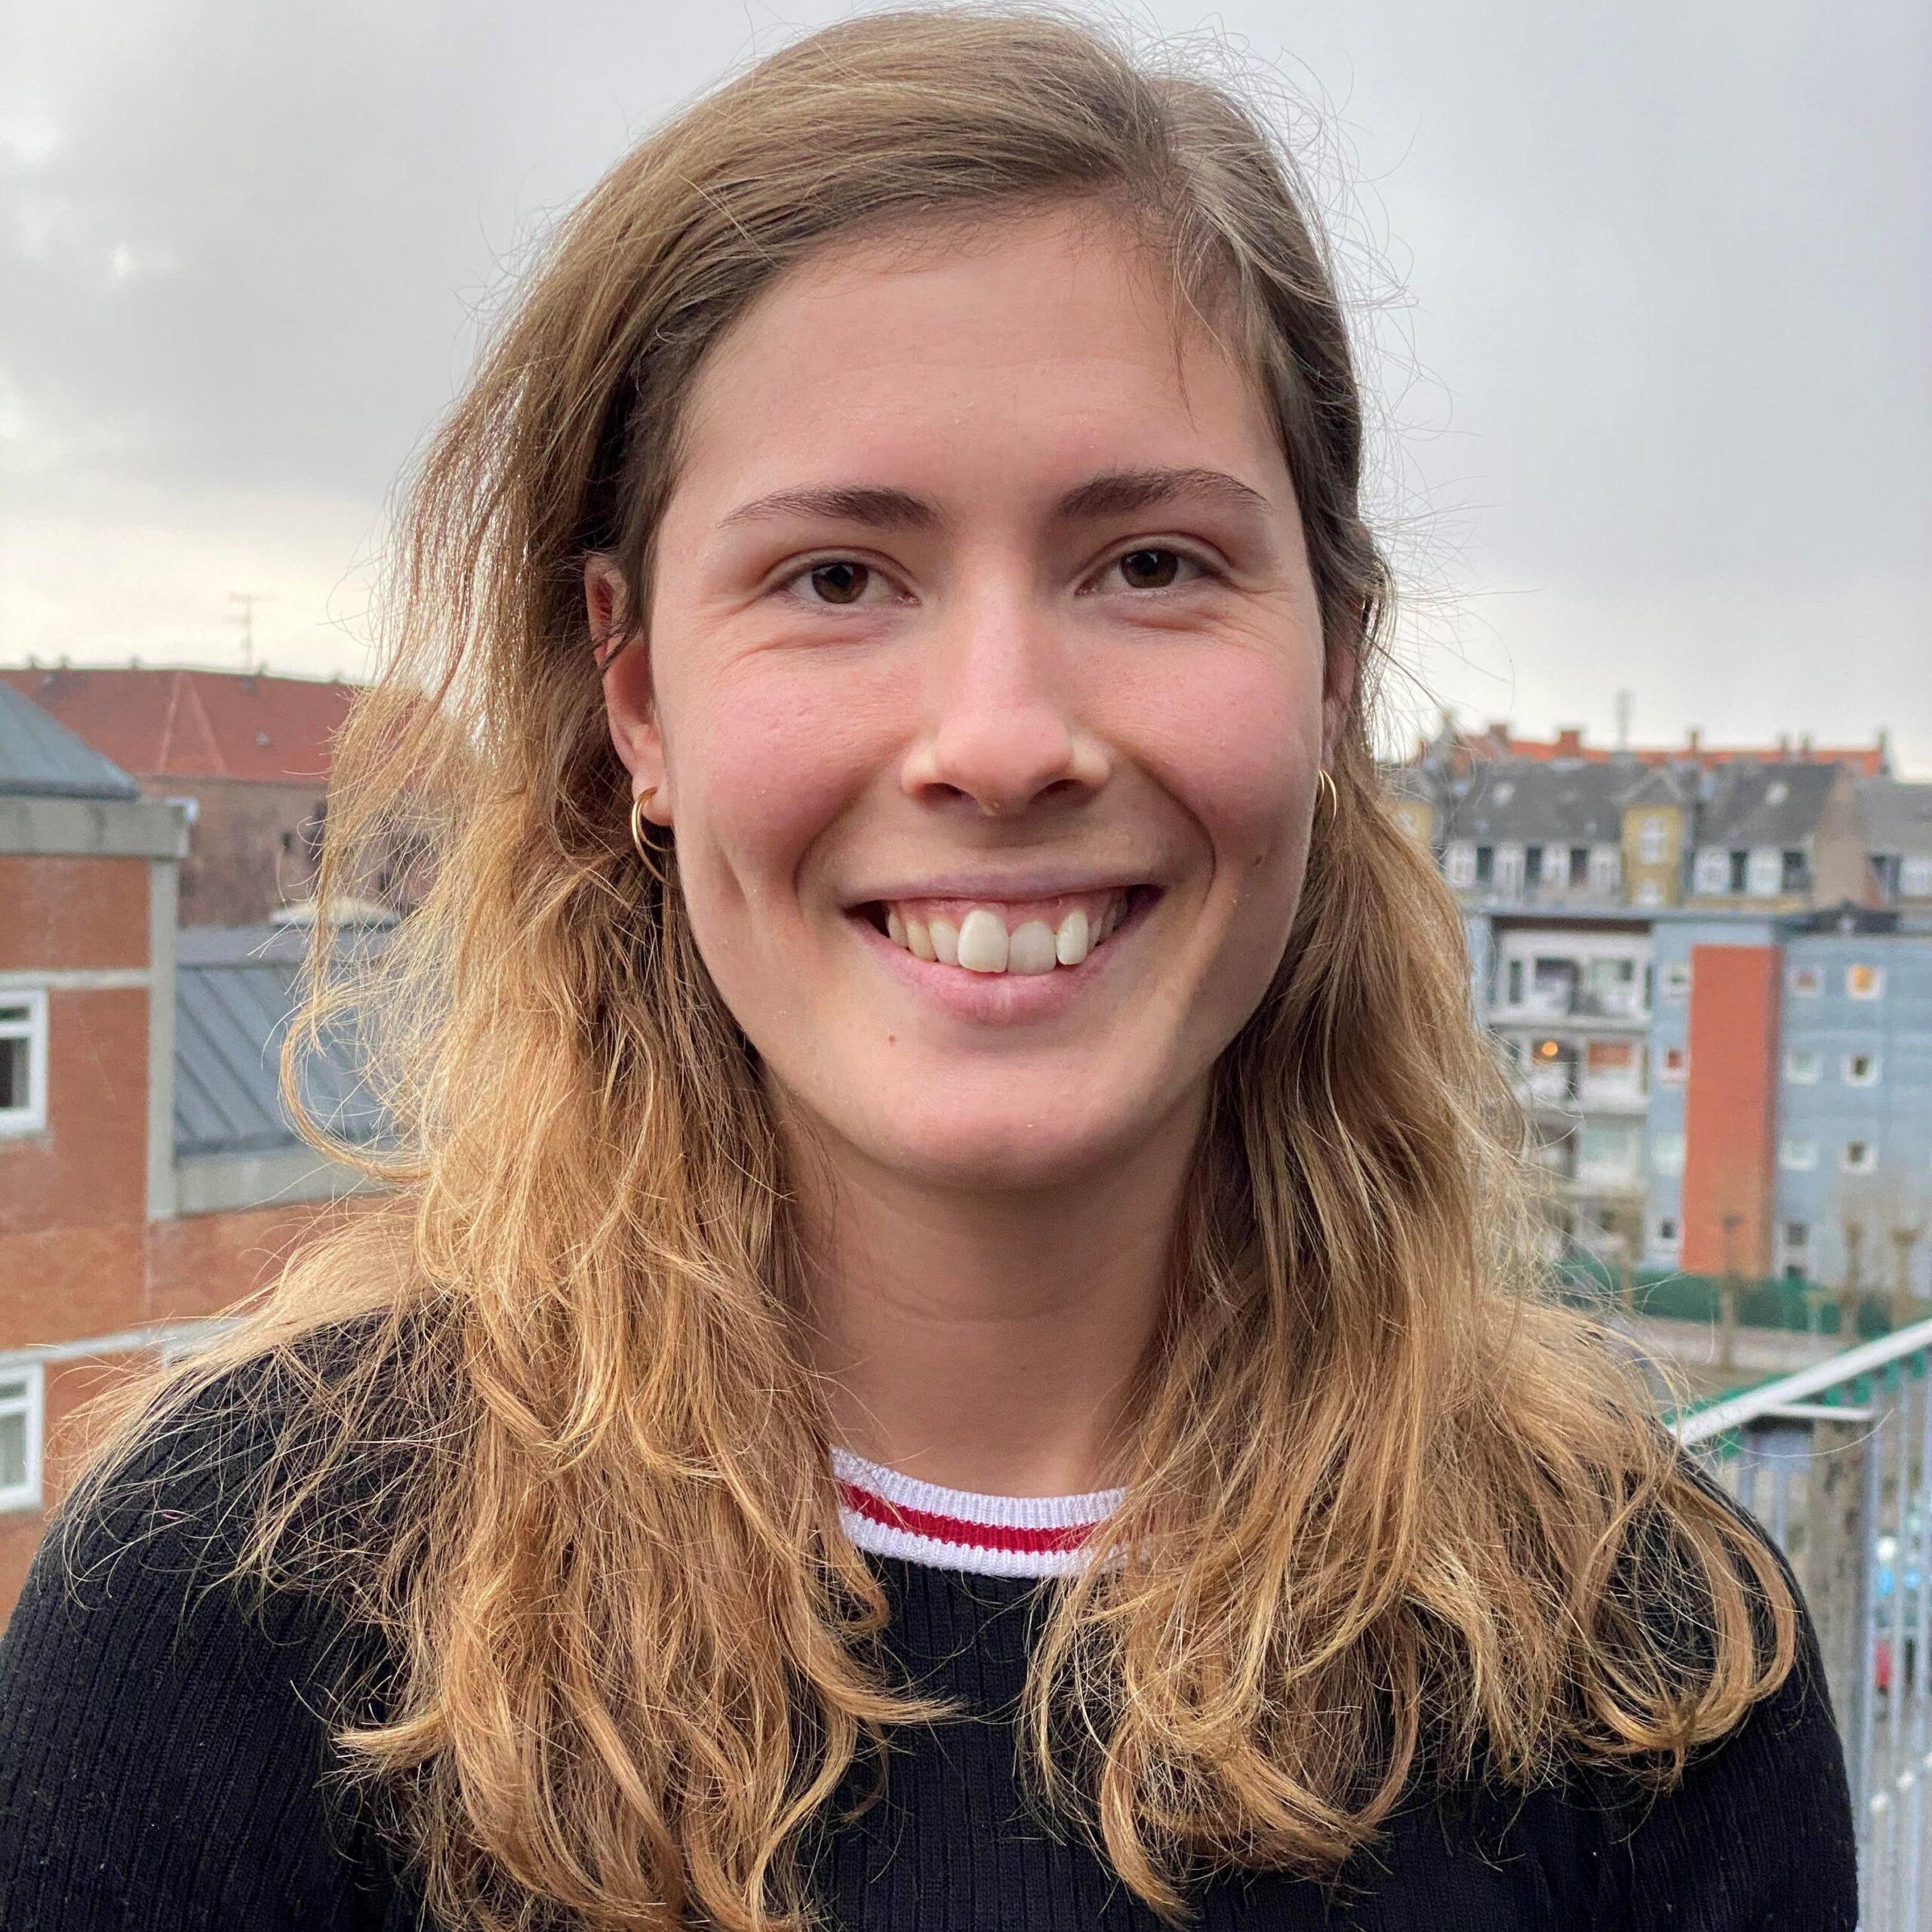 Isabella Heegaard Rytz